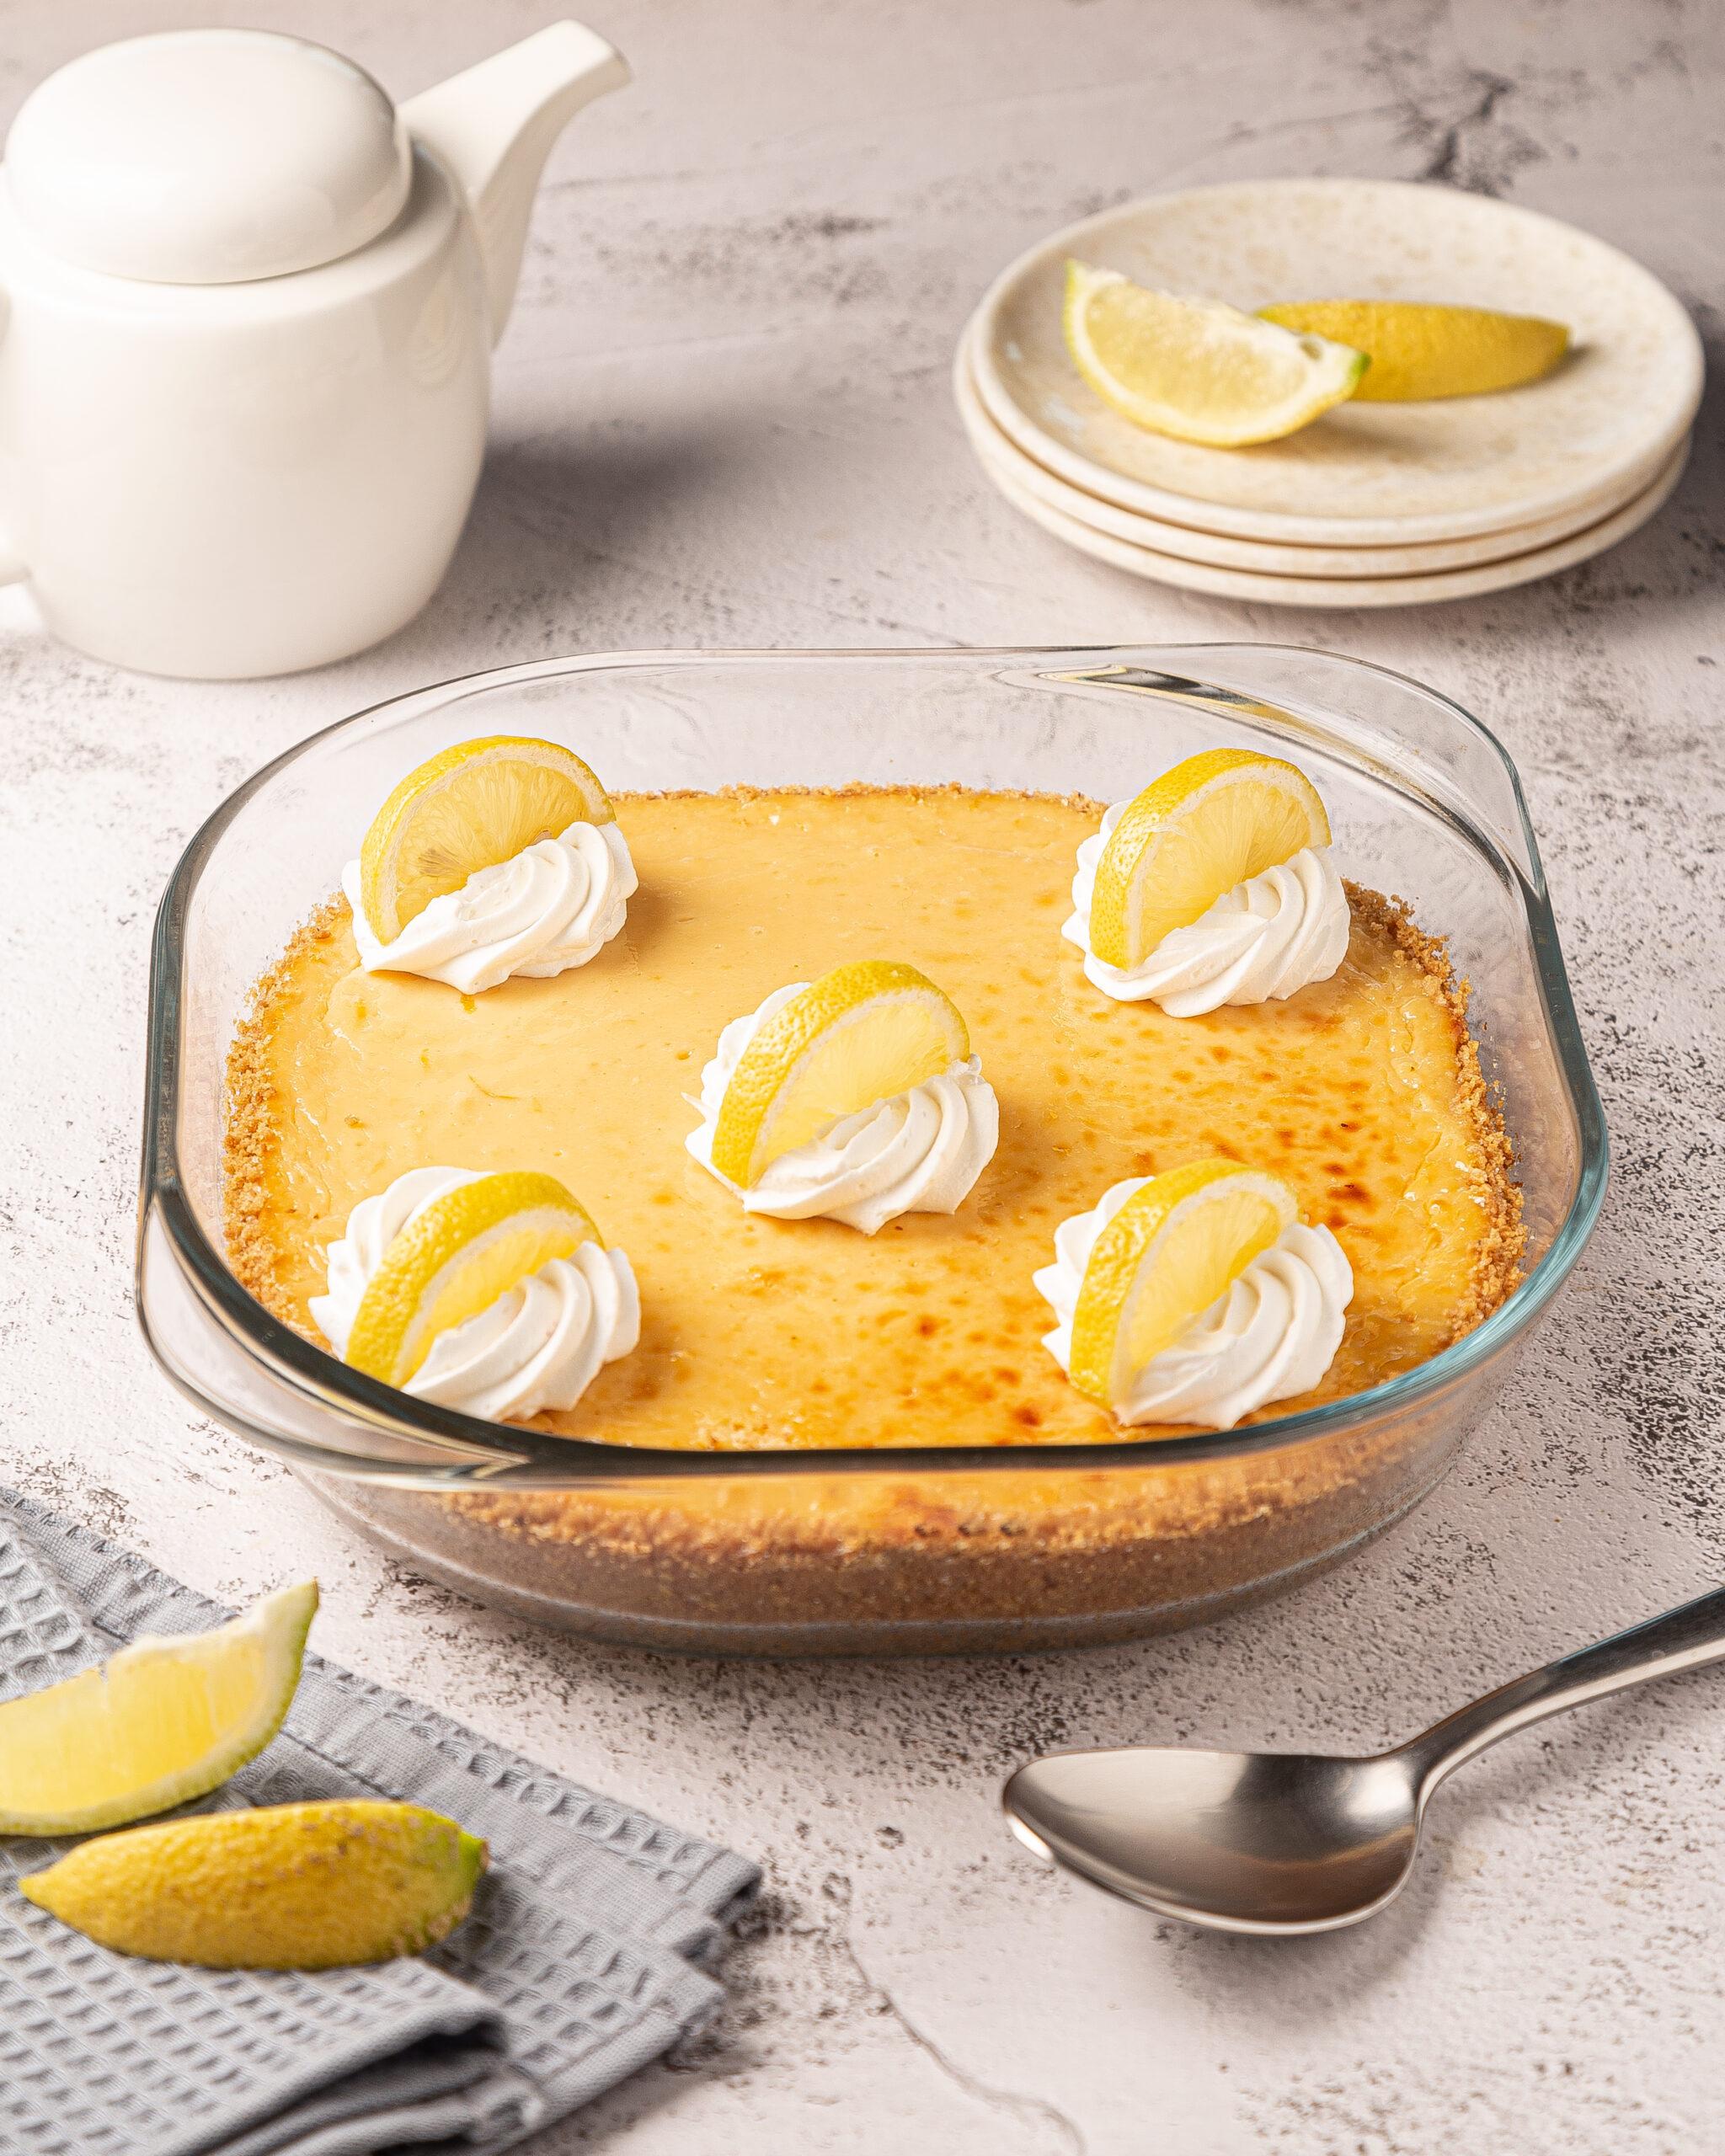 sugar-daddys-lemon-pie-casserole